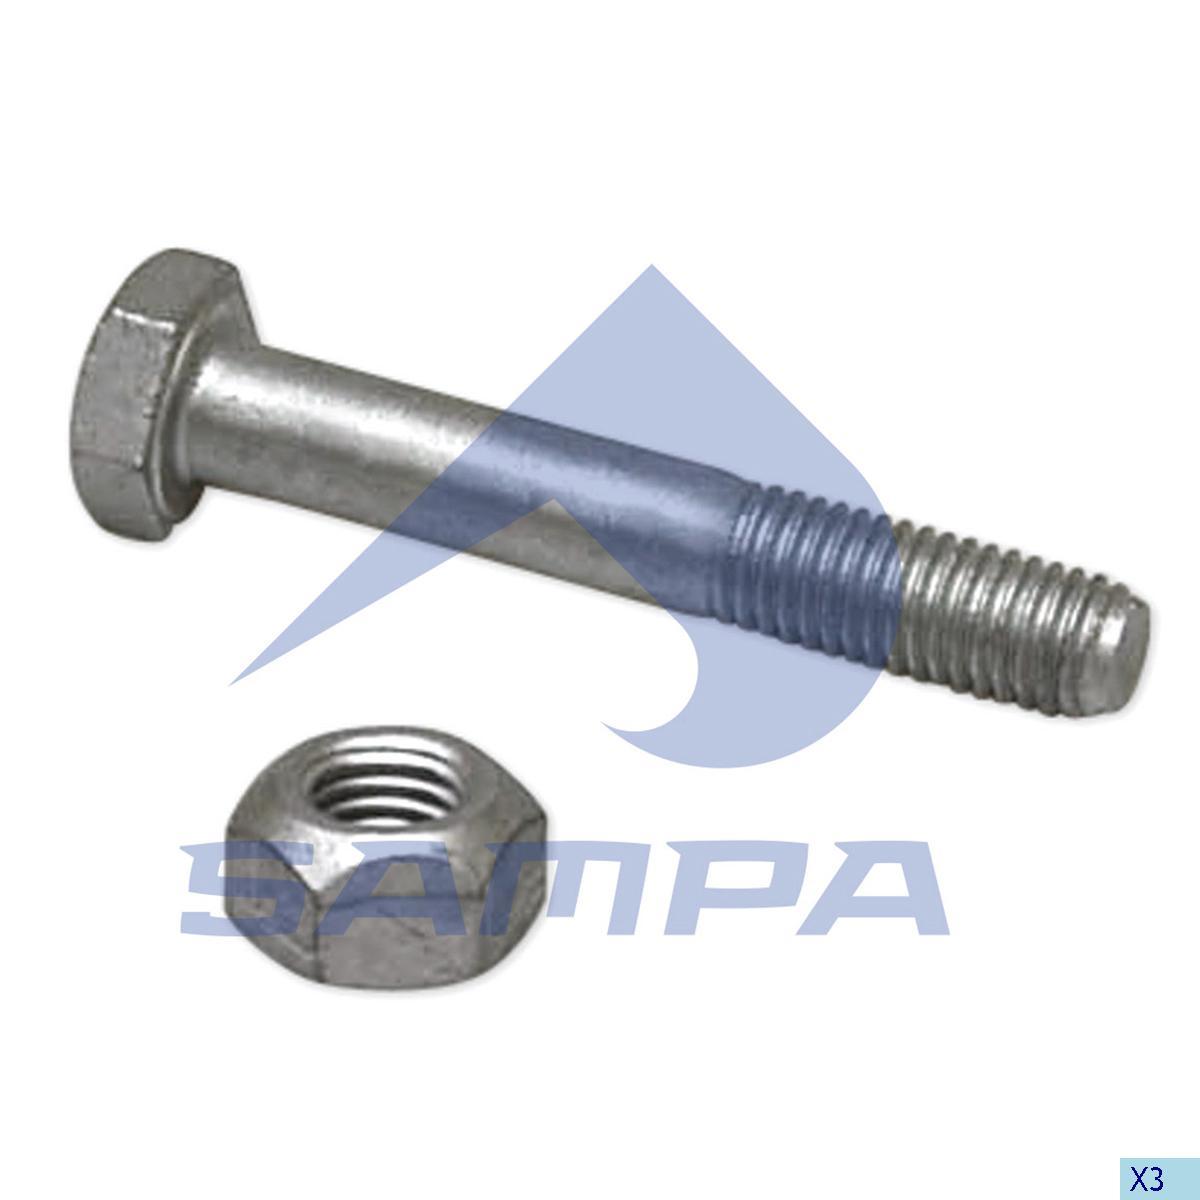 Repair Kit, Fifth Wheel, Jost, Complementary Equipment